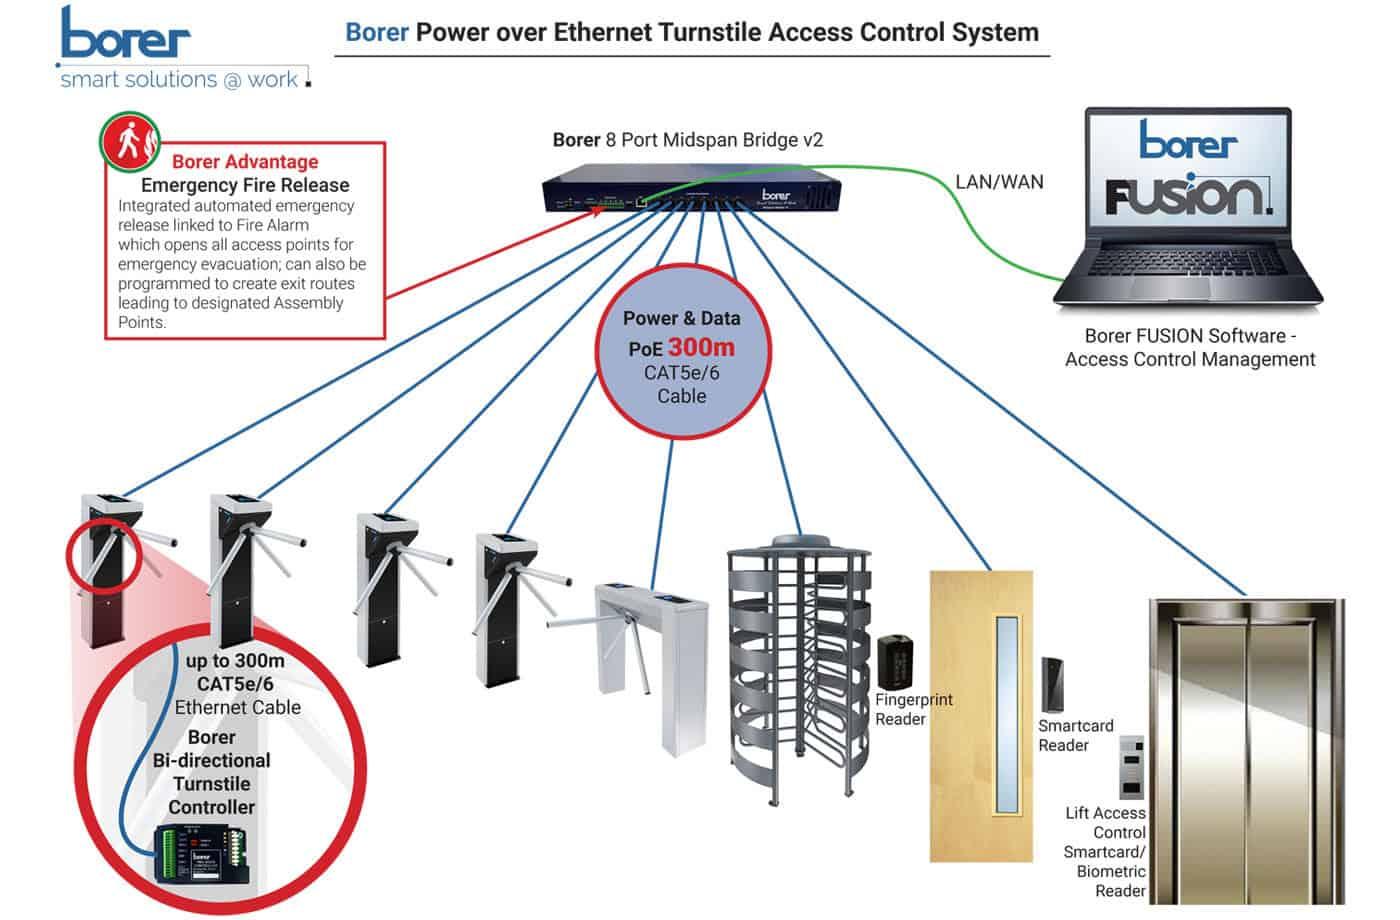 Borer PoE Turnstile Access Control System